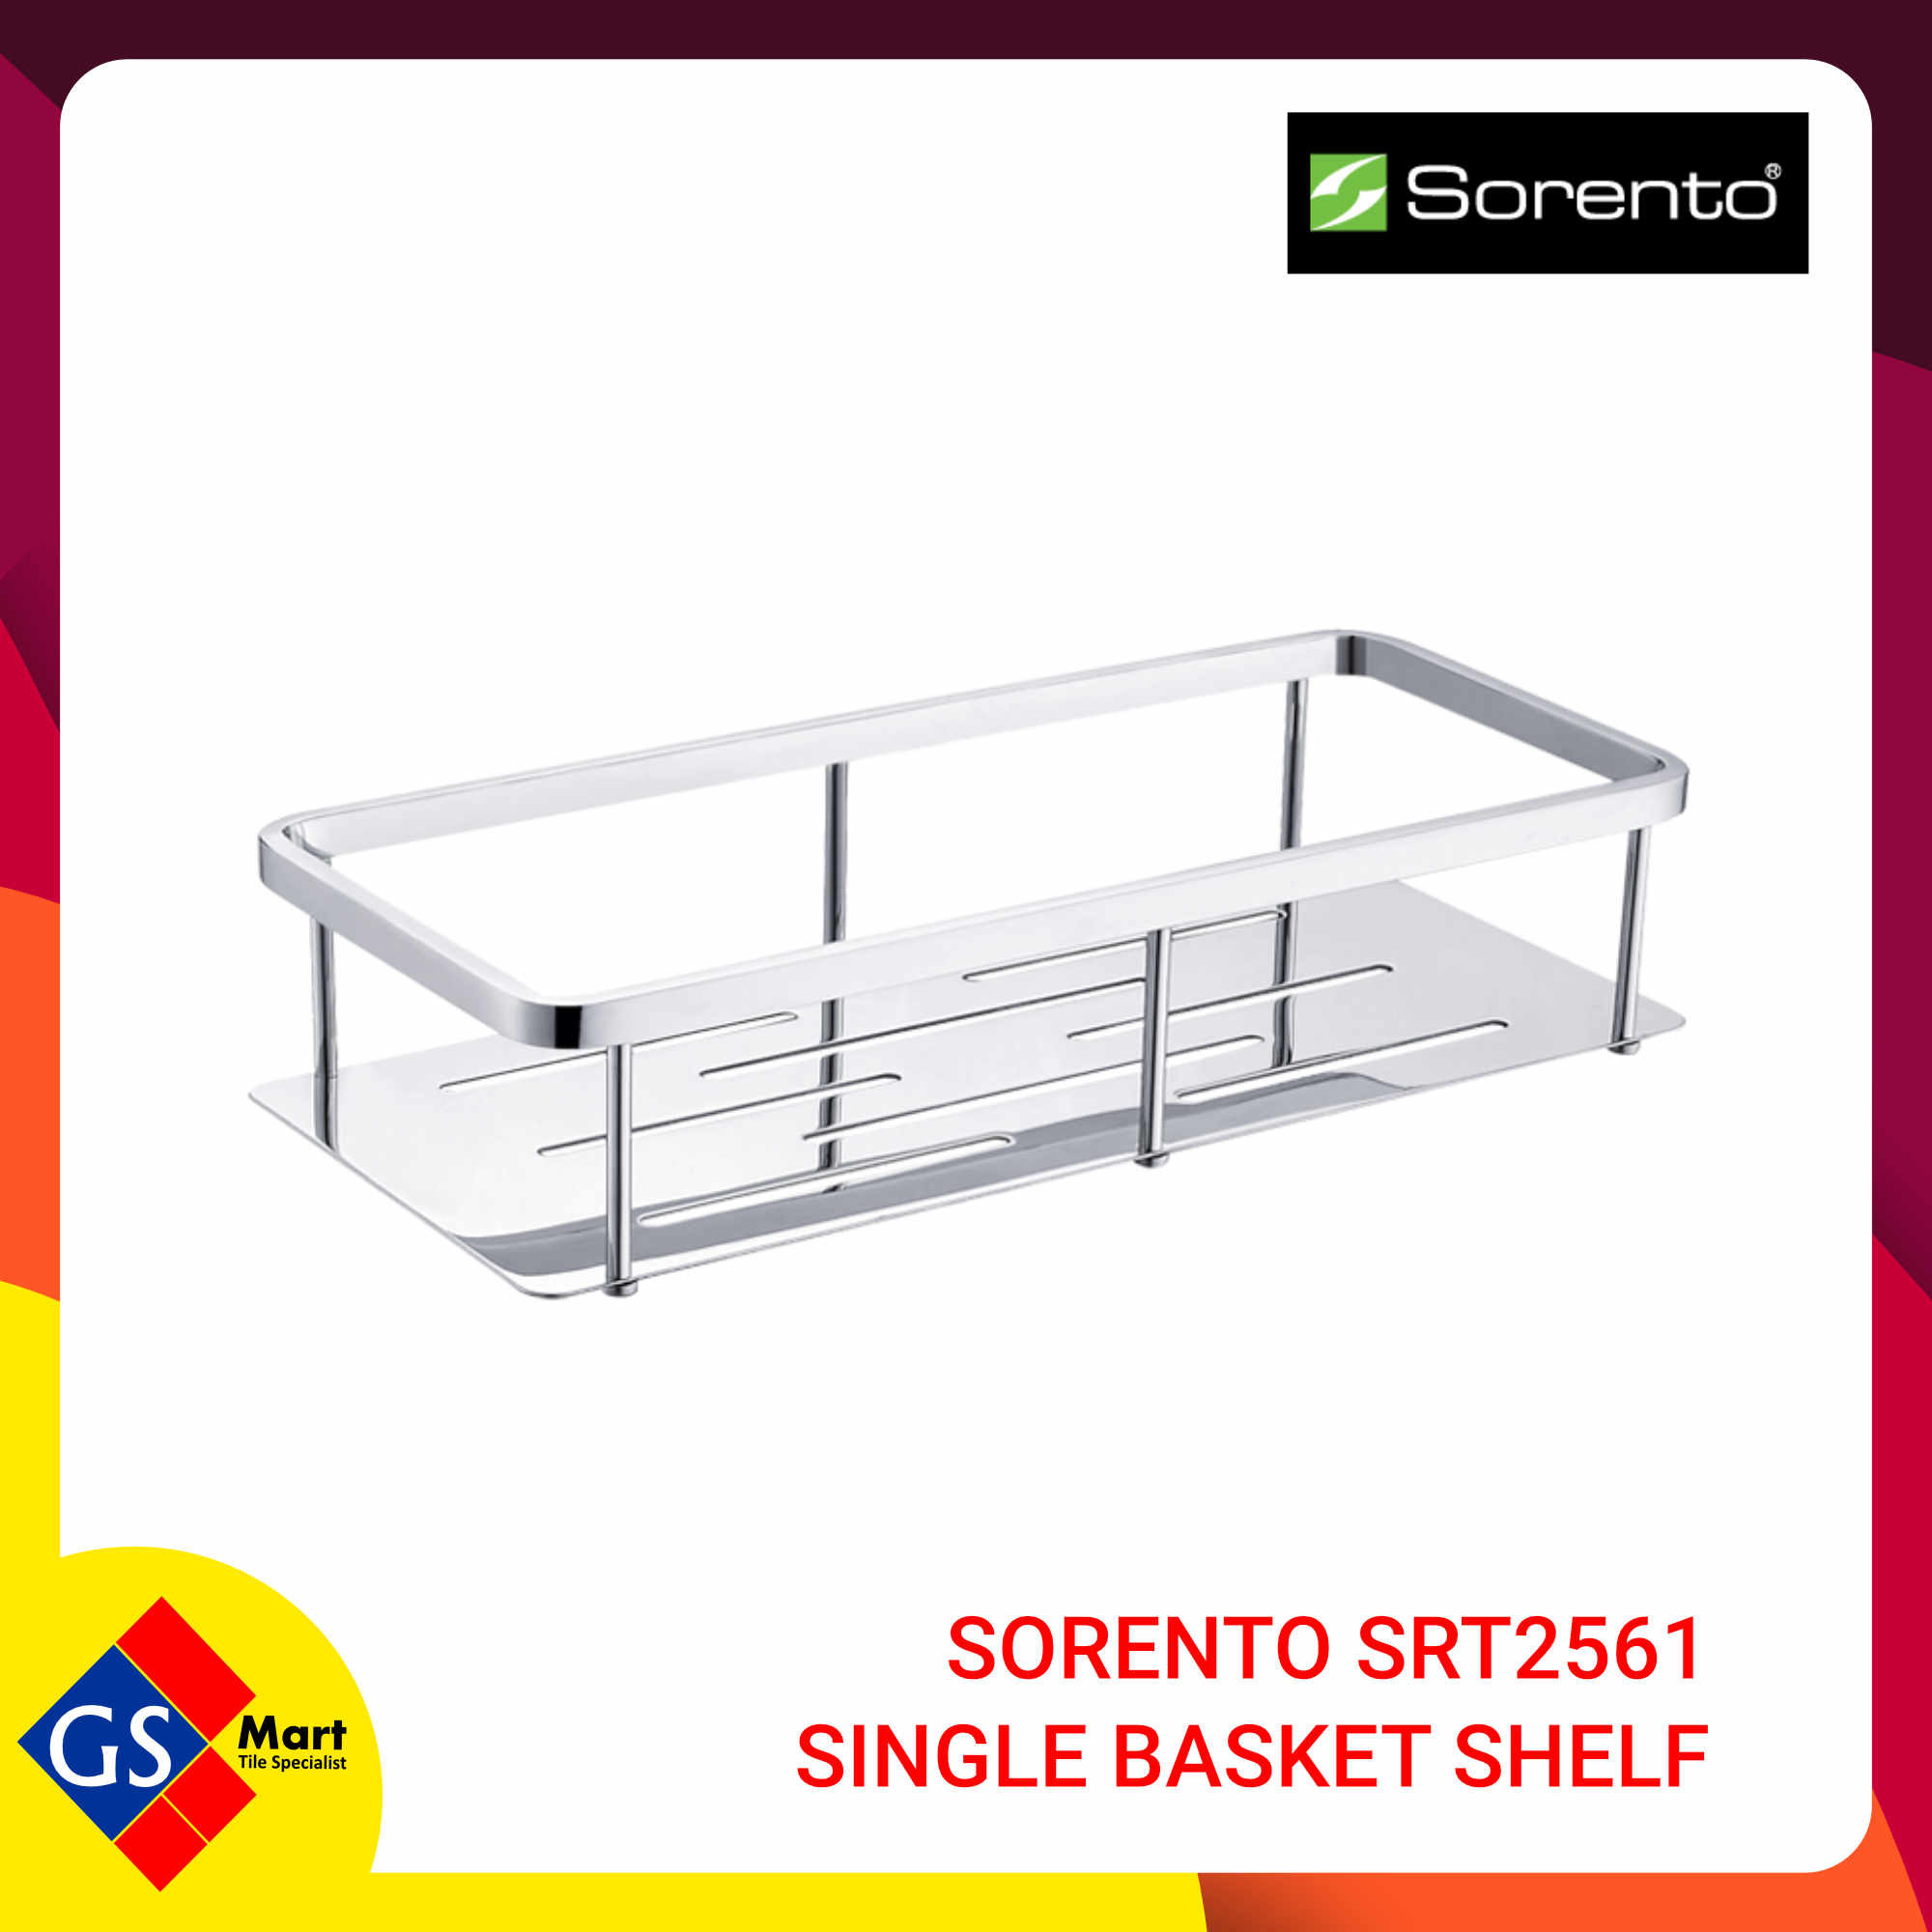 image of SORENTO SRT2561 SINGLE BASKET SHELF